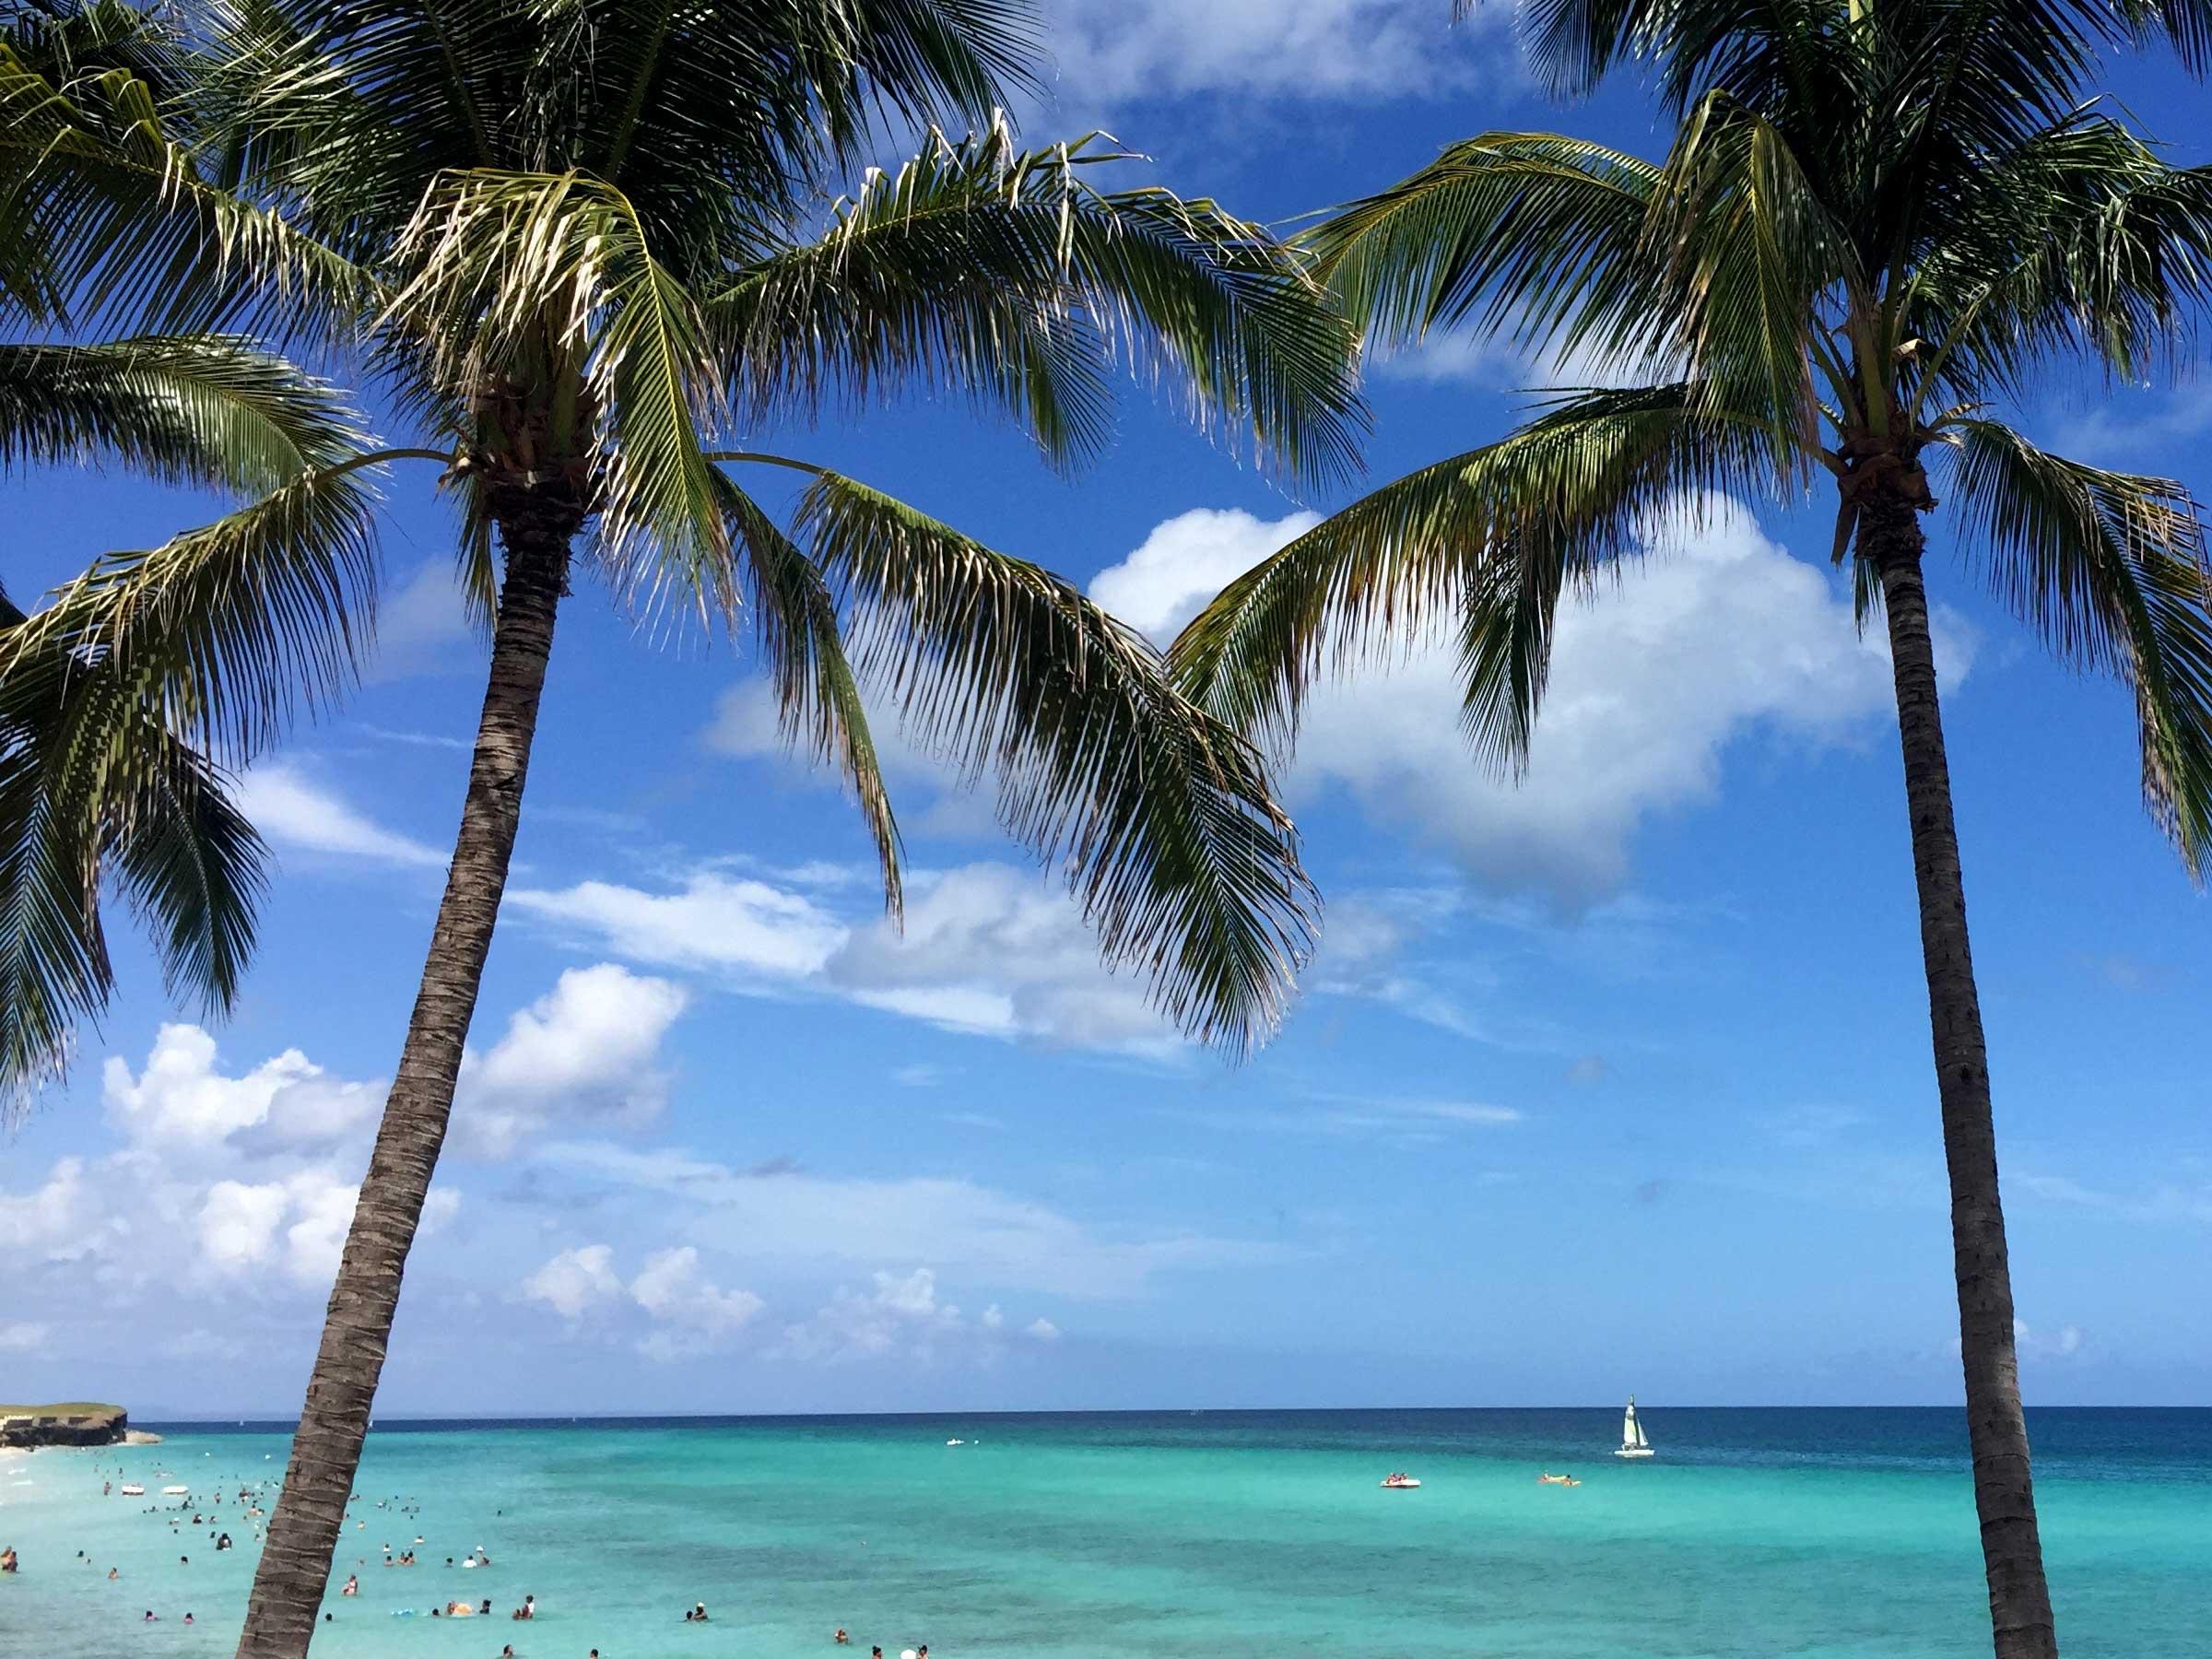 kuba Varadero-zwei-Palmen-Meerblick